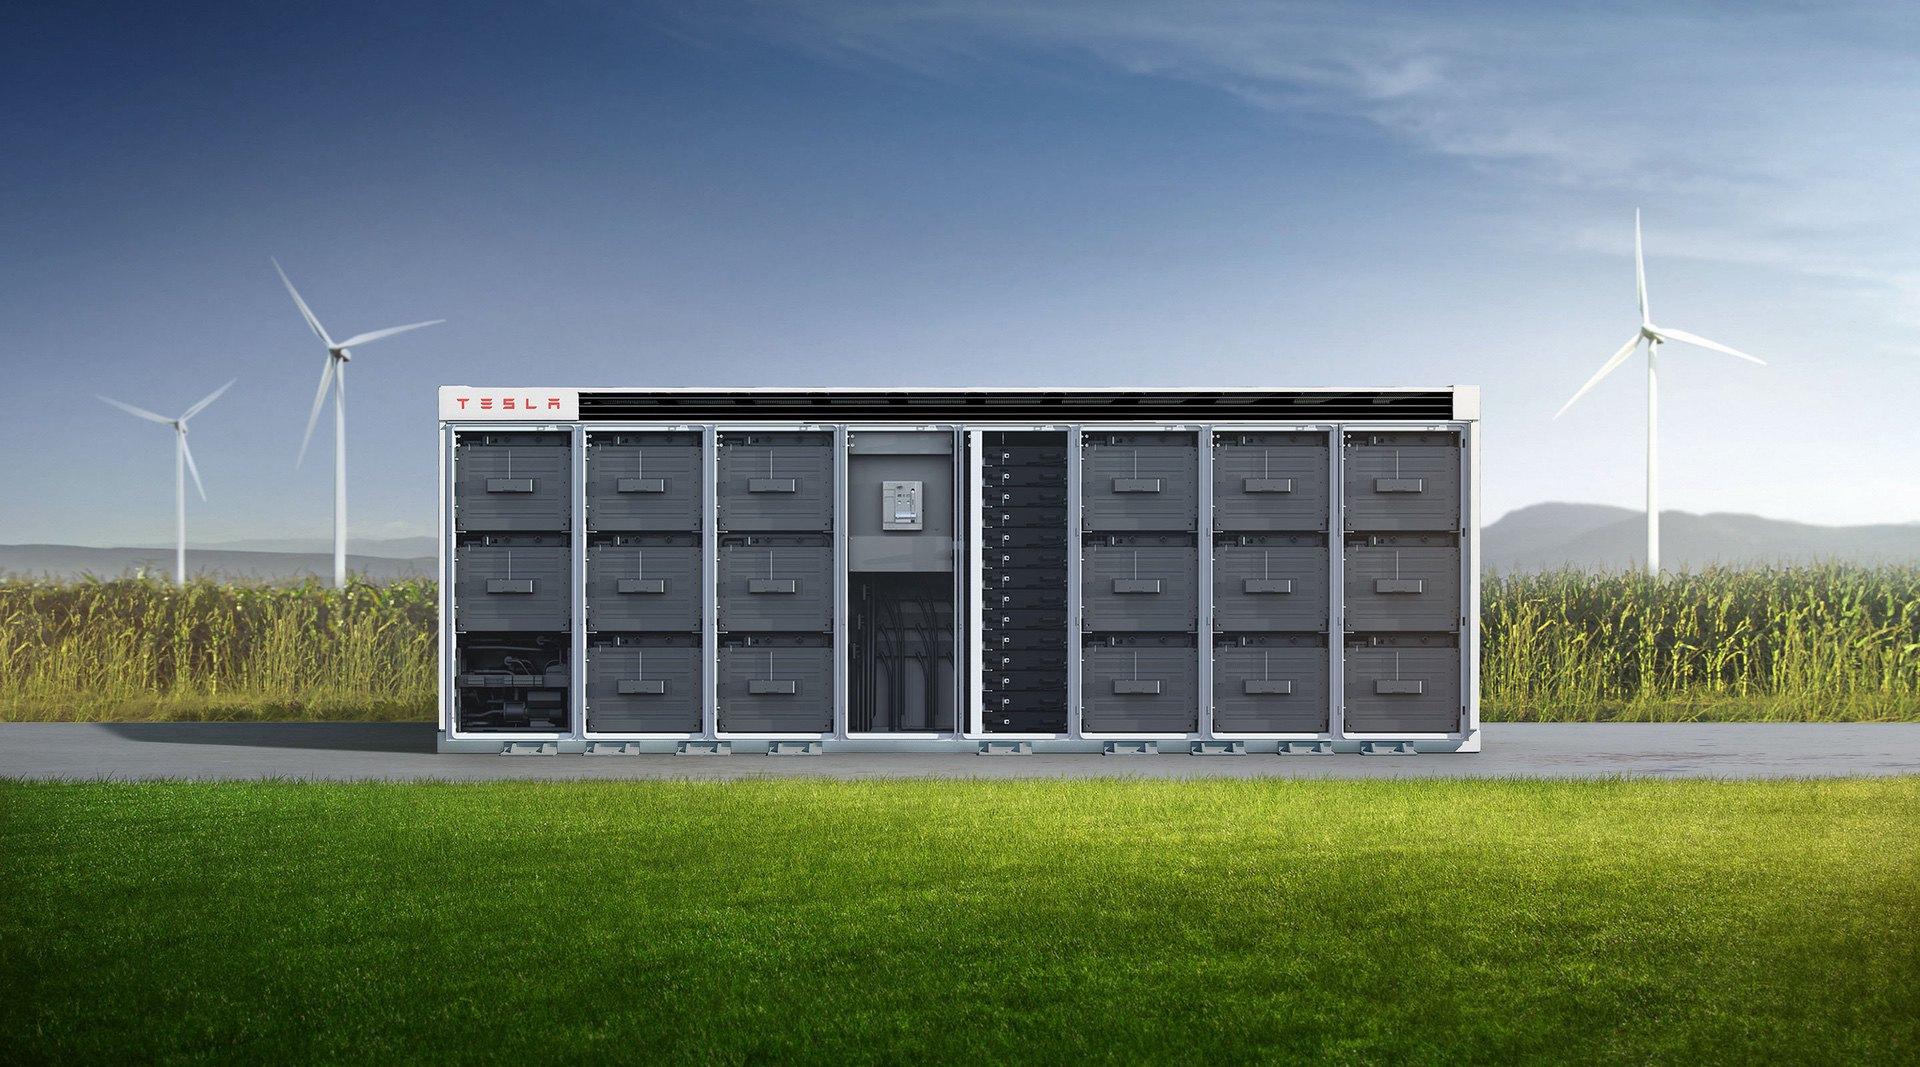 Tesla_Megafactory-0001